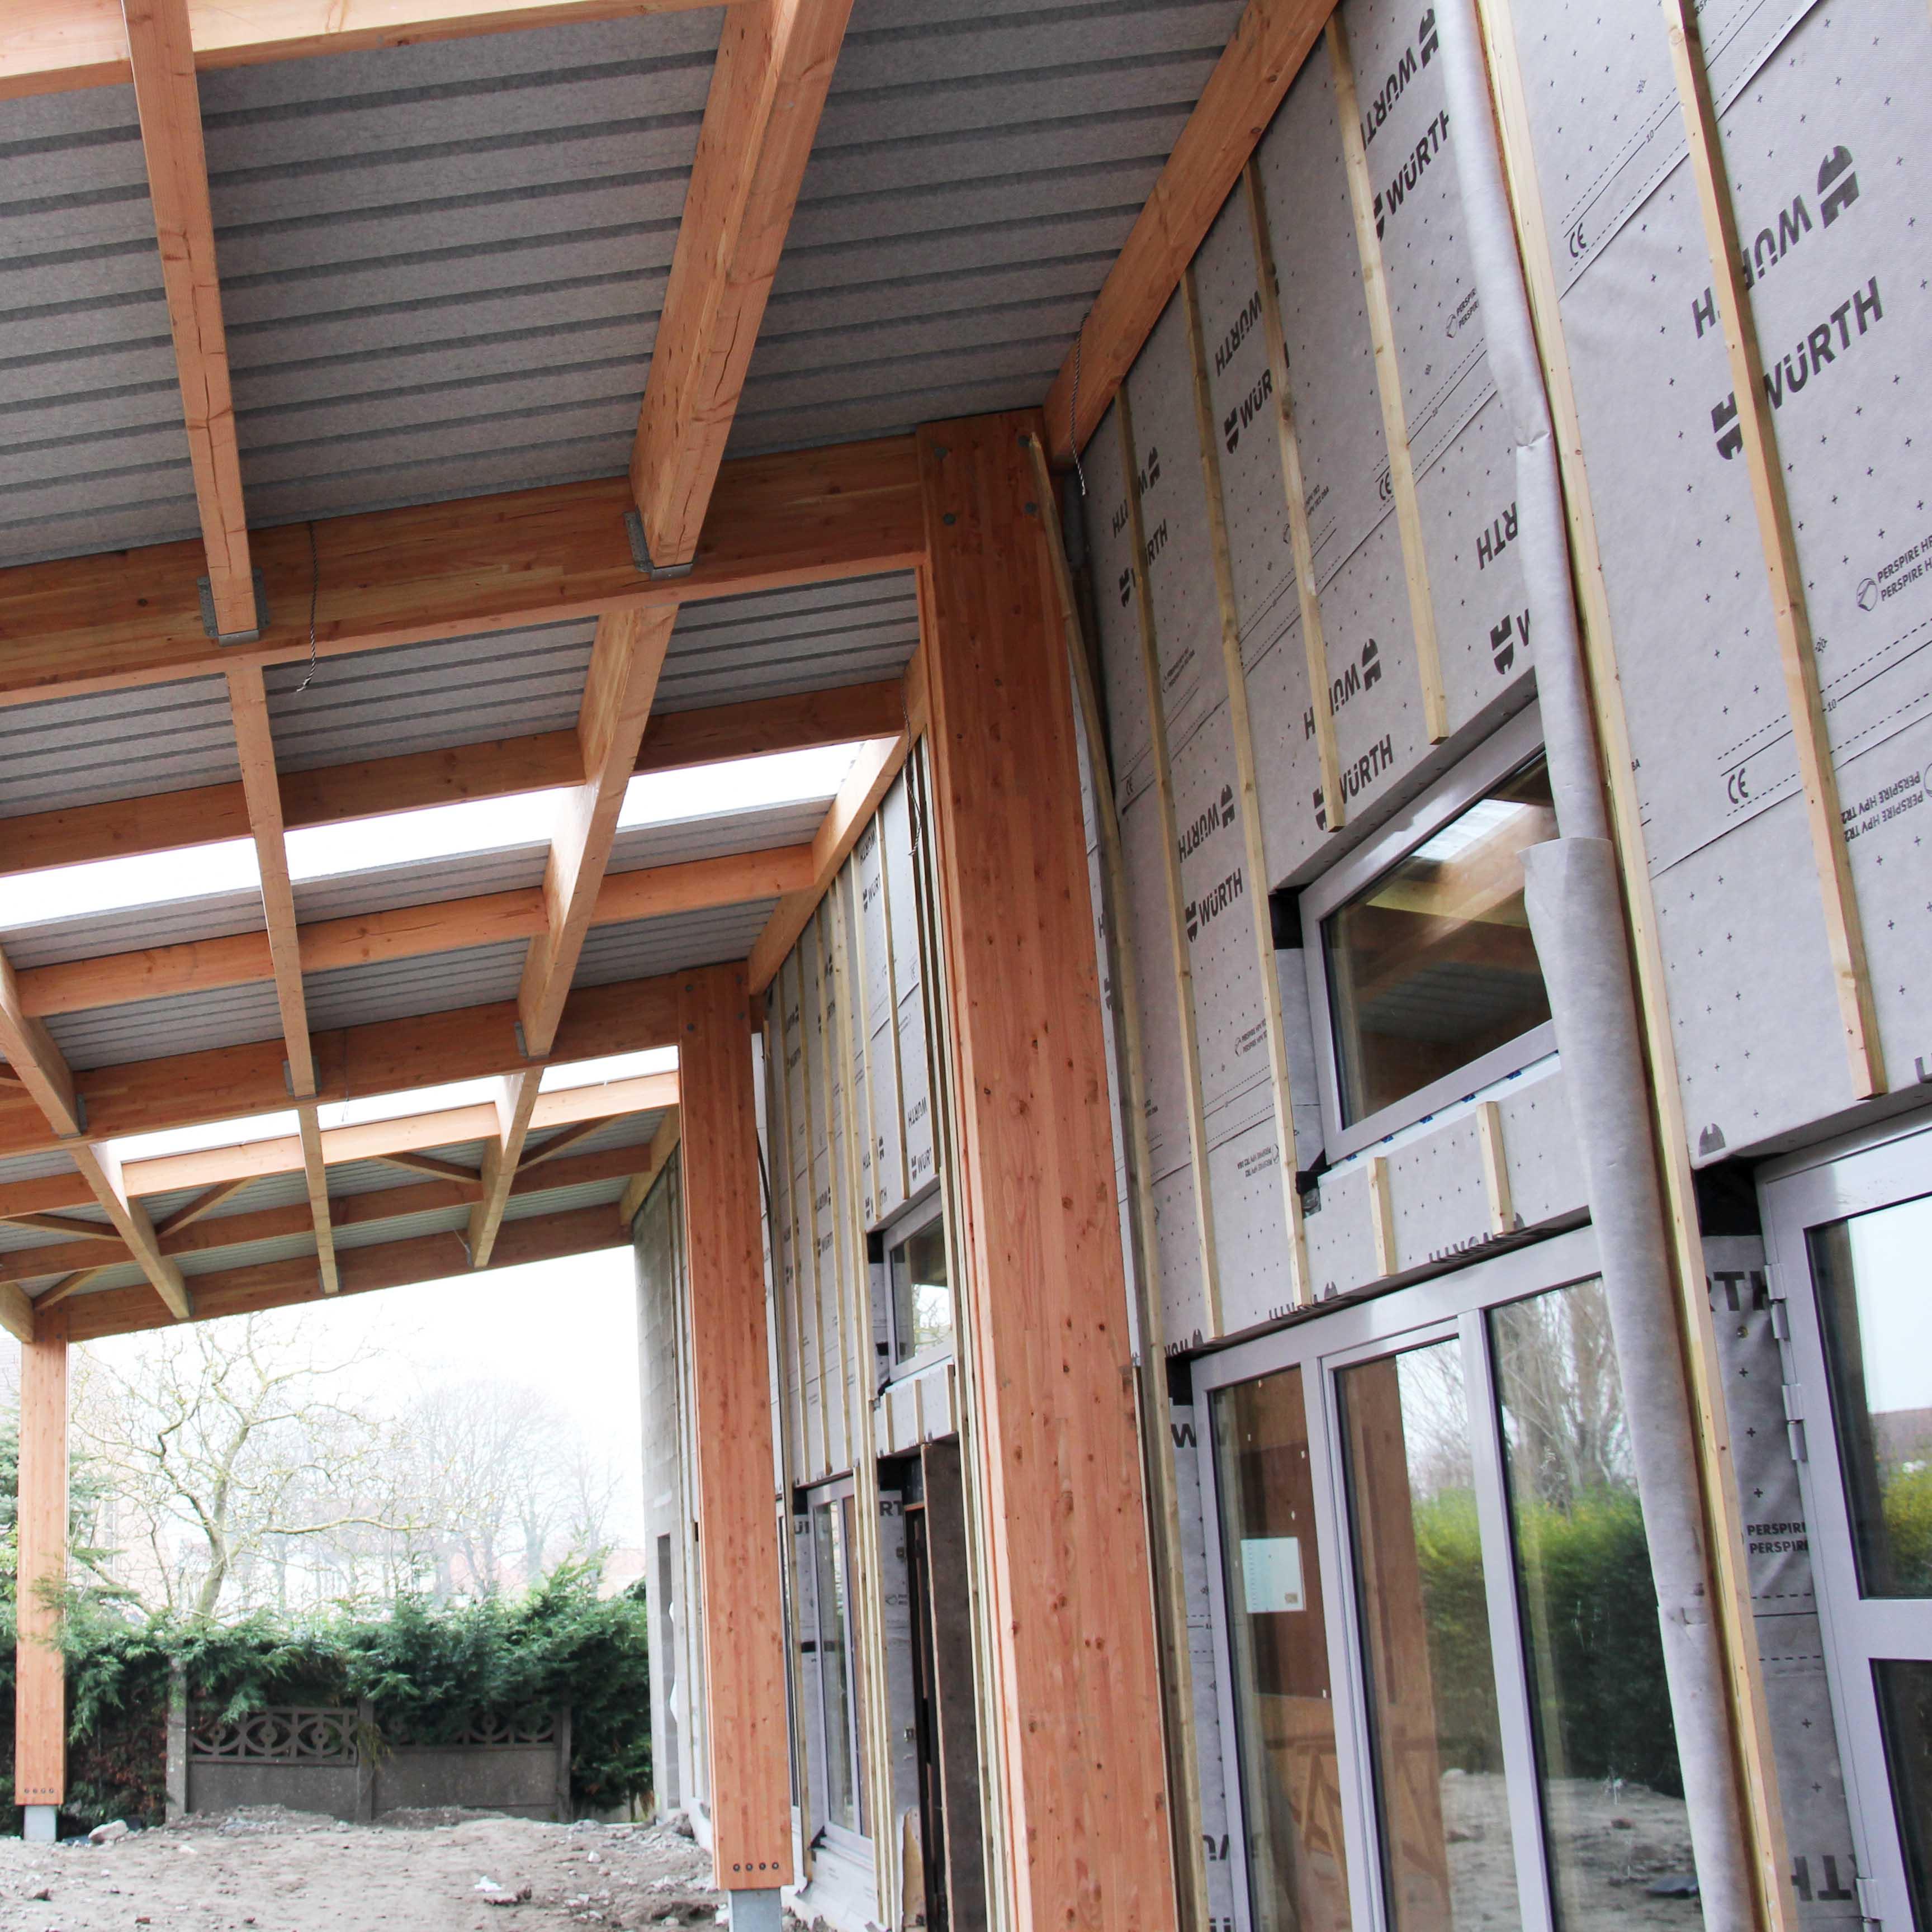 Ossature bois Spycker - Charpentier des Flandres